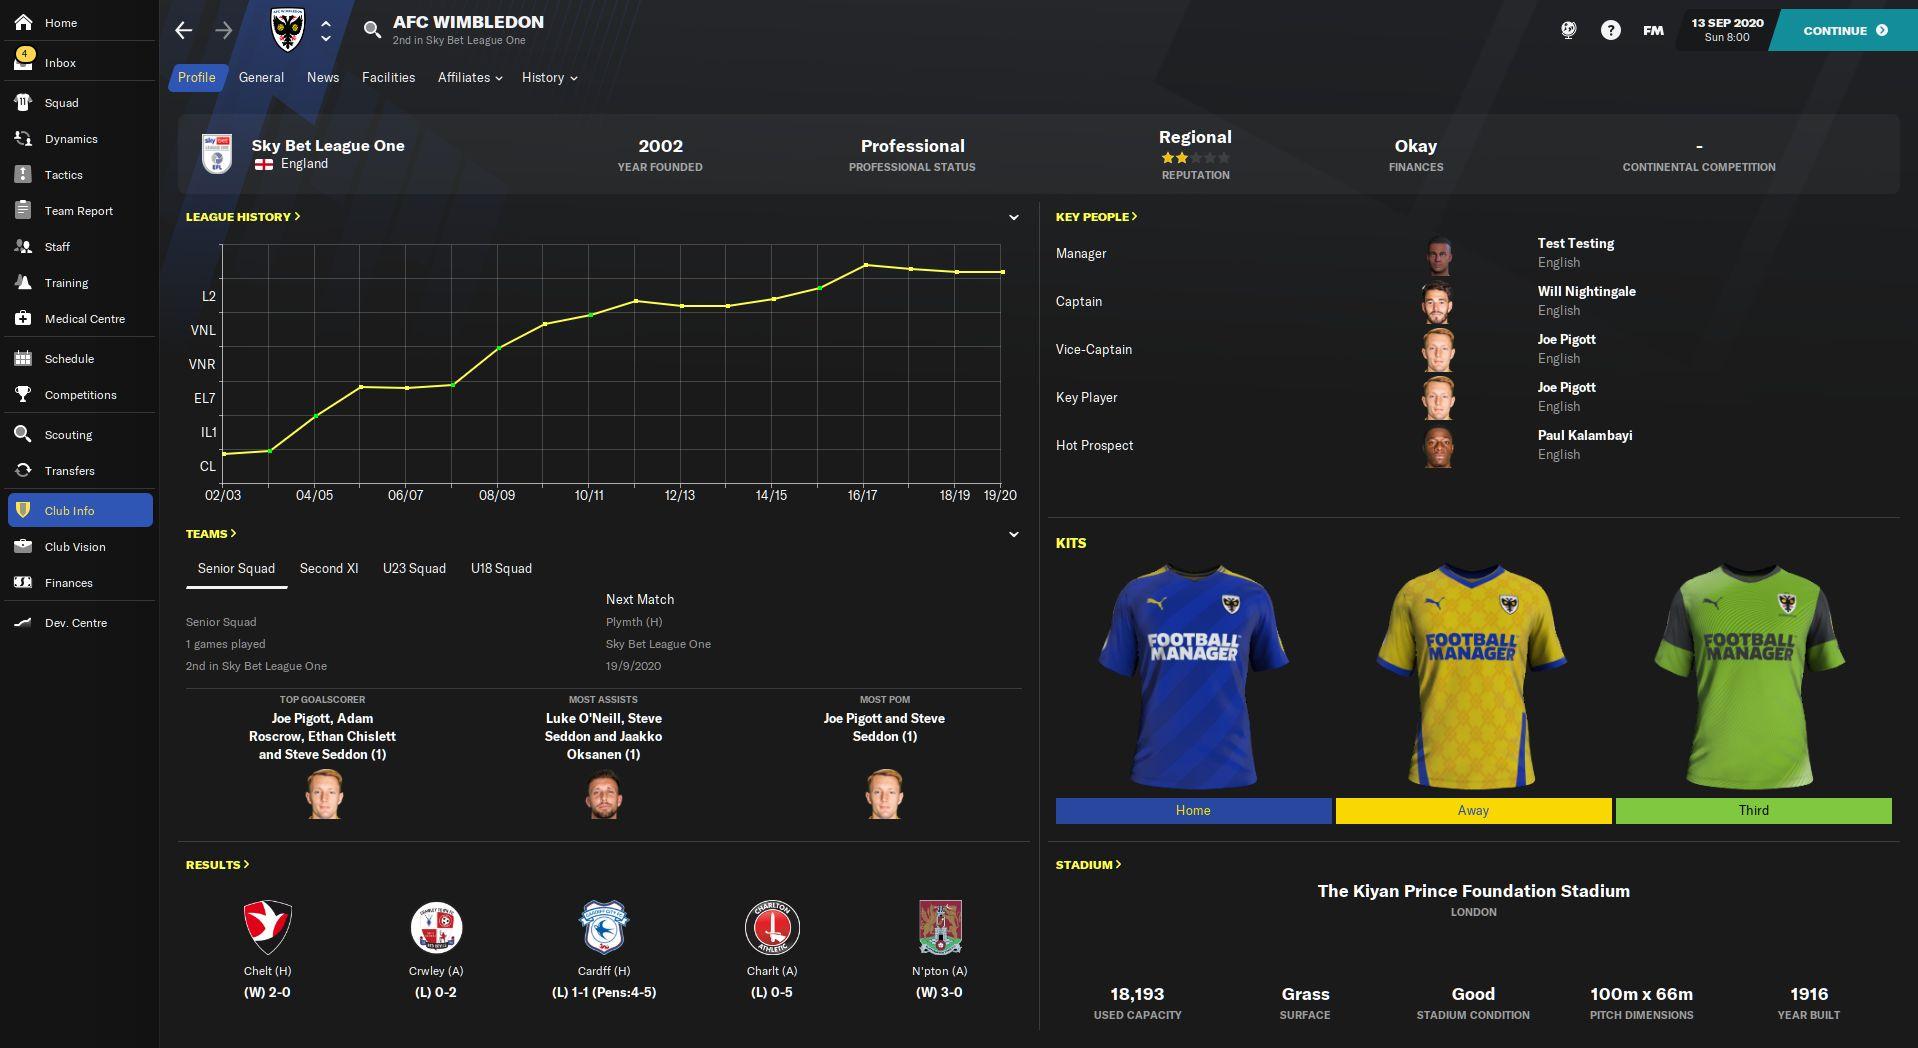 Football Manager 2021 Skin - Default Dark